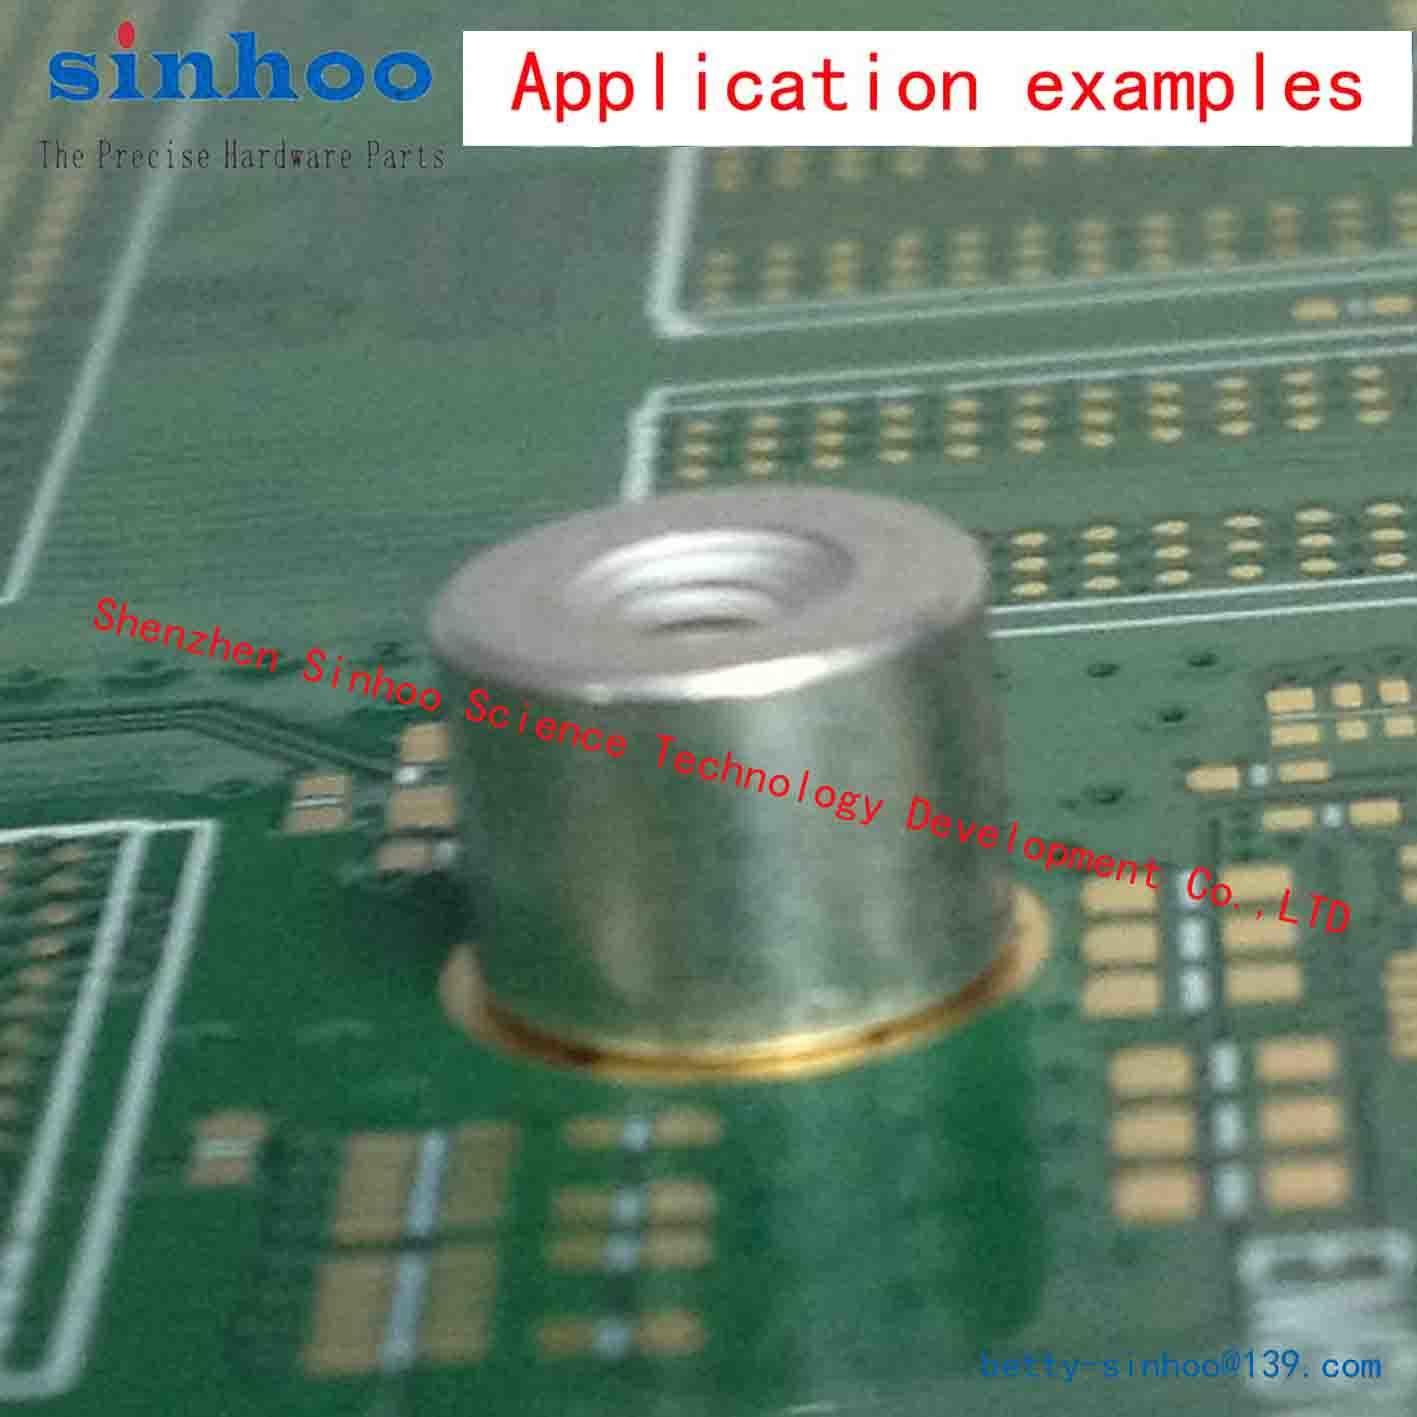 SMT Nut, Weld Nut, Smtso-M2.5-4et, Reel Package, Solder Nut, Standoff, Brass, Tape